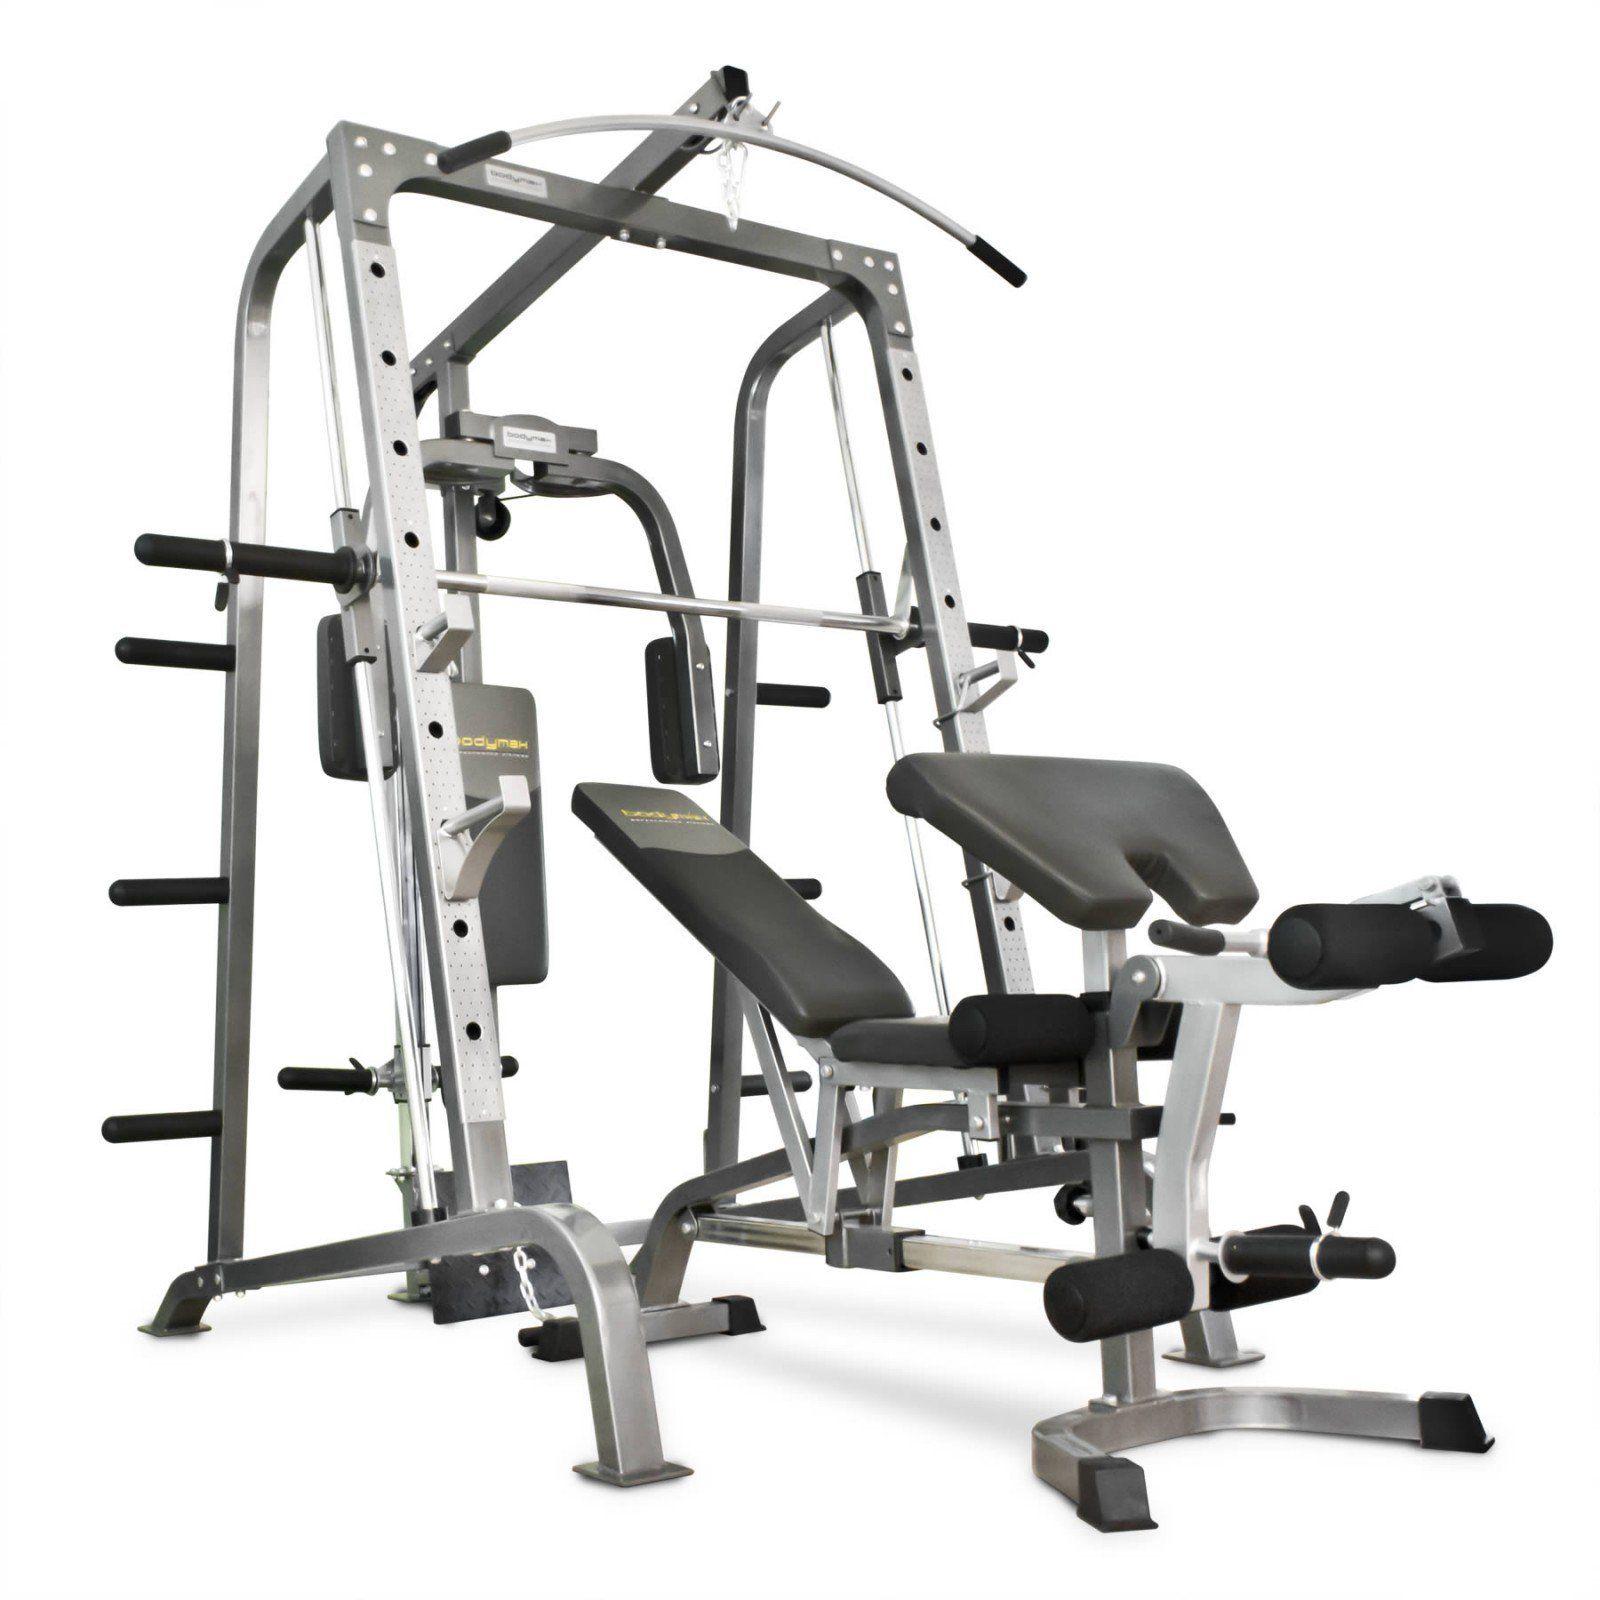 BodyMax CF380 Smith Machine Multi Gym At home gym, Multi